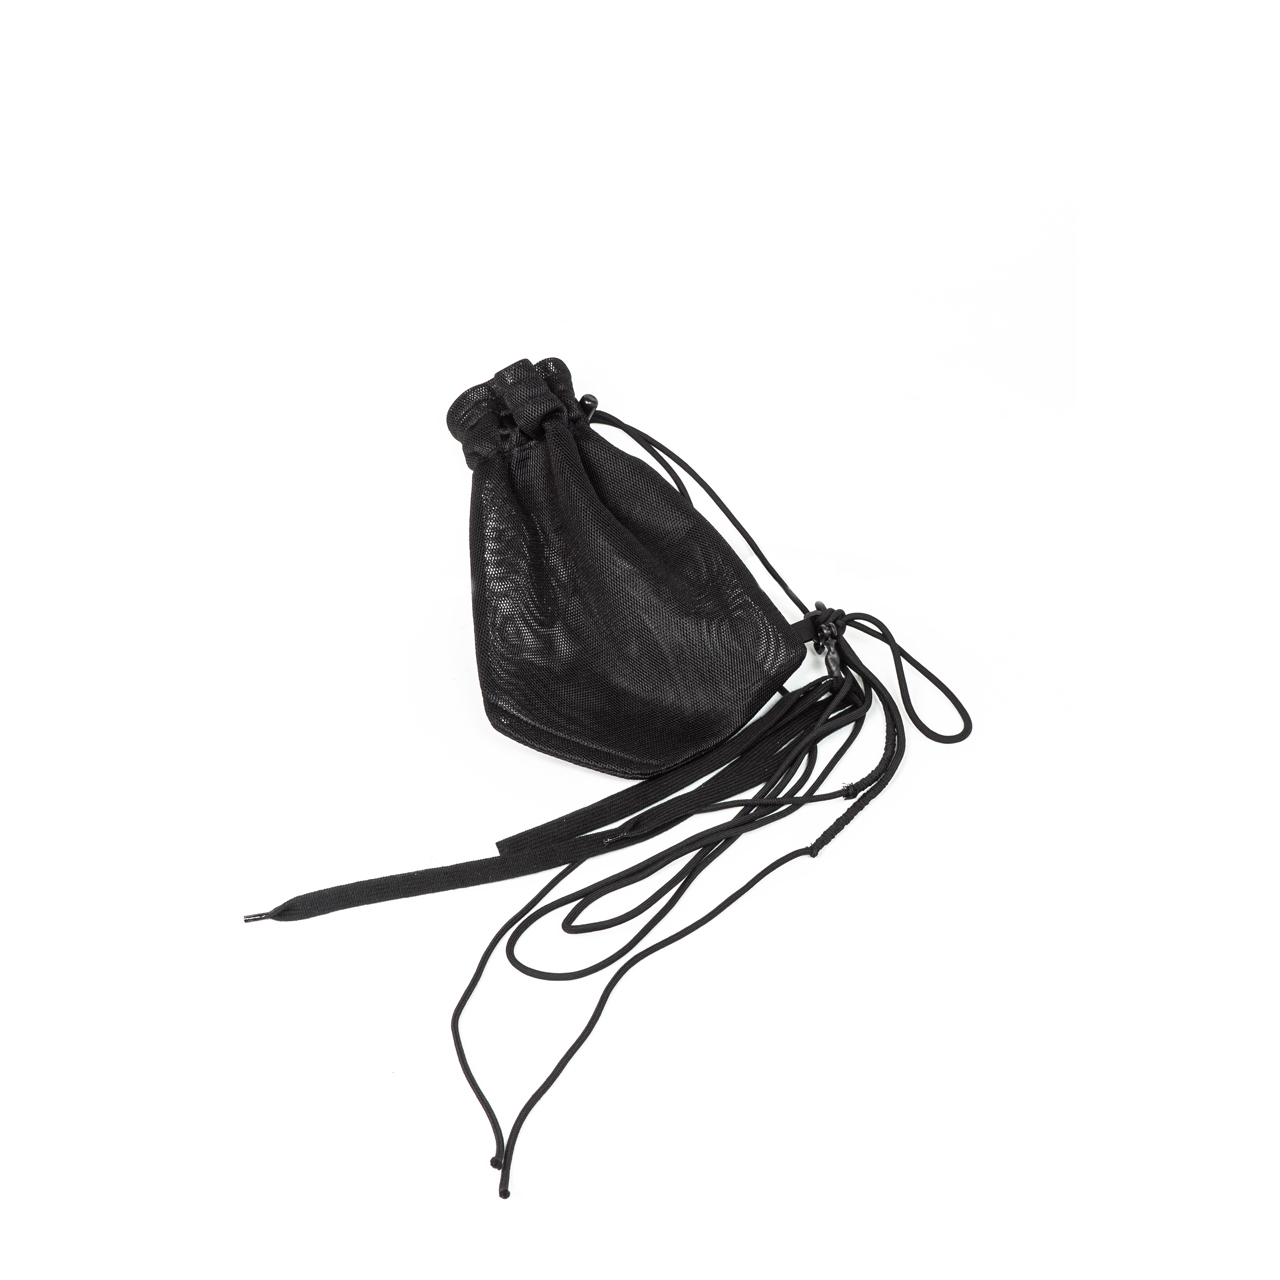 700BGU4-BLACK / ストラップメッシュバッグ